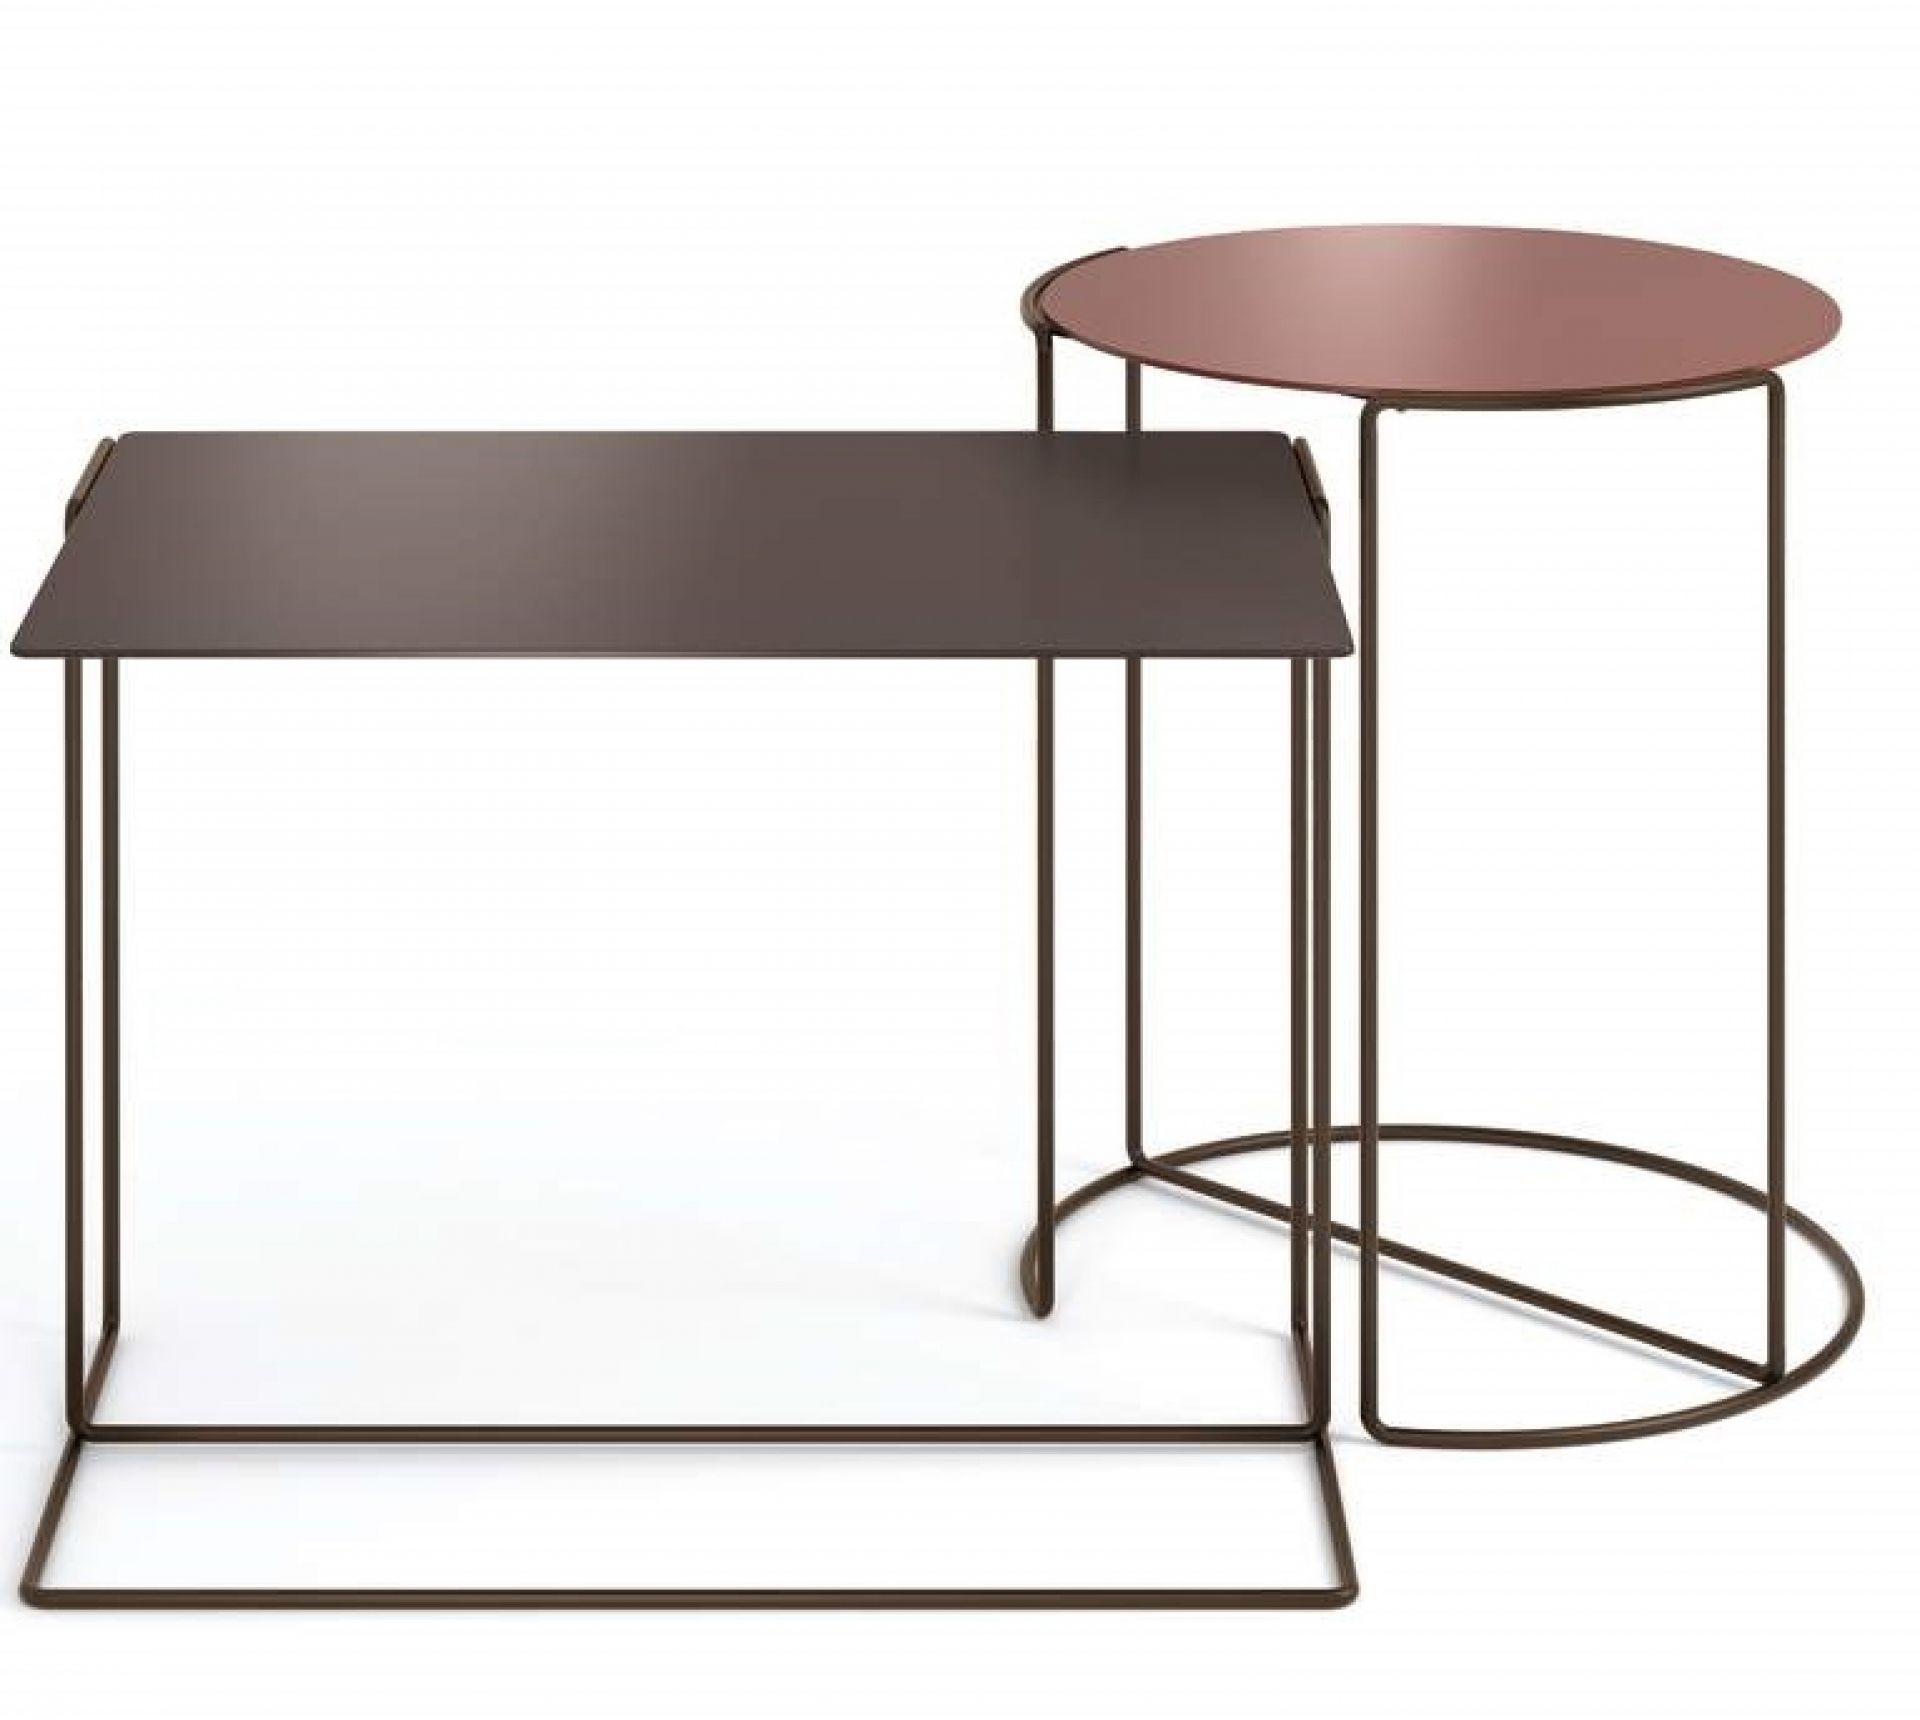 Oki Side Table Walter Knoll Walter Knoll 131 T3